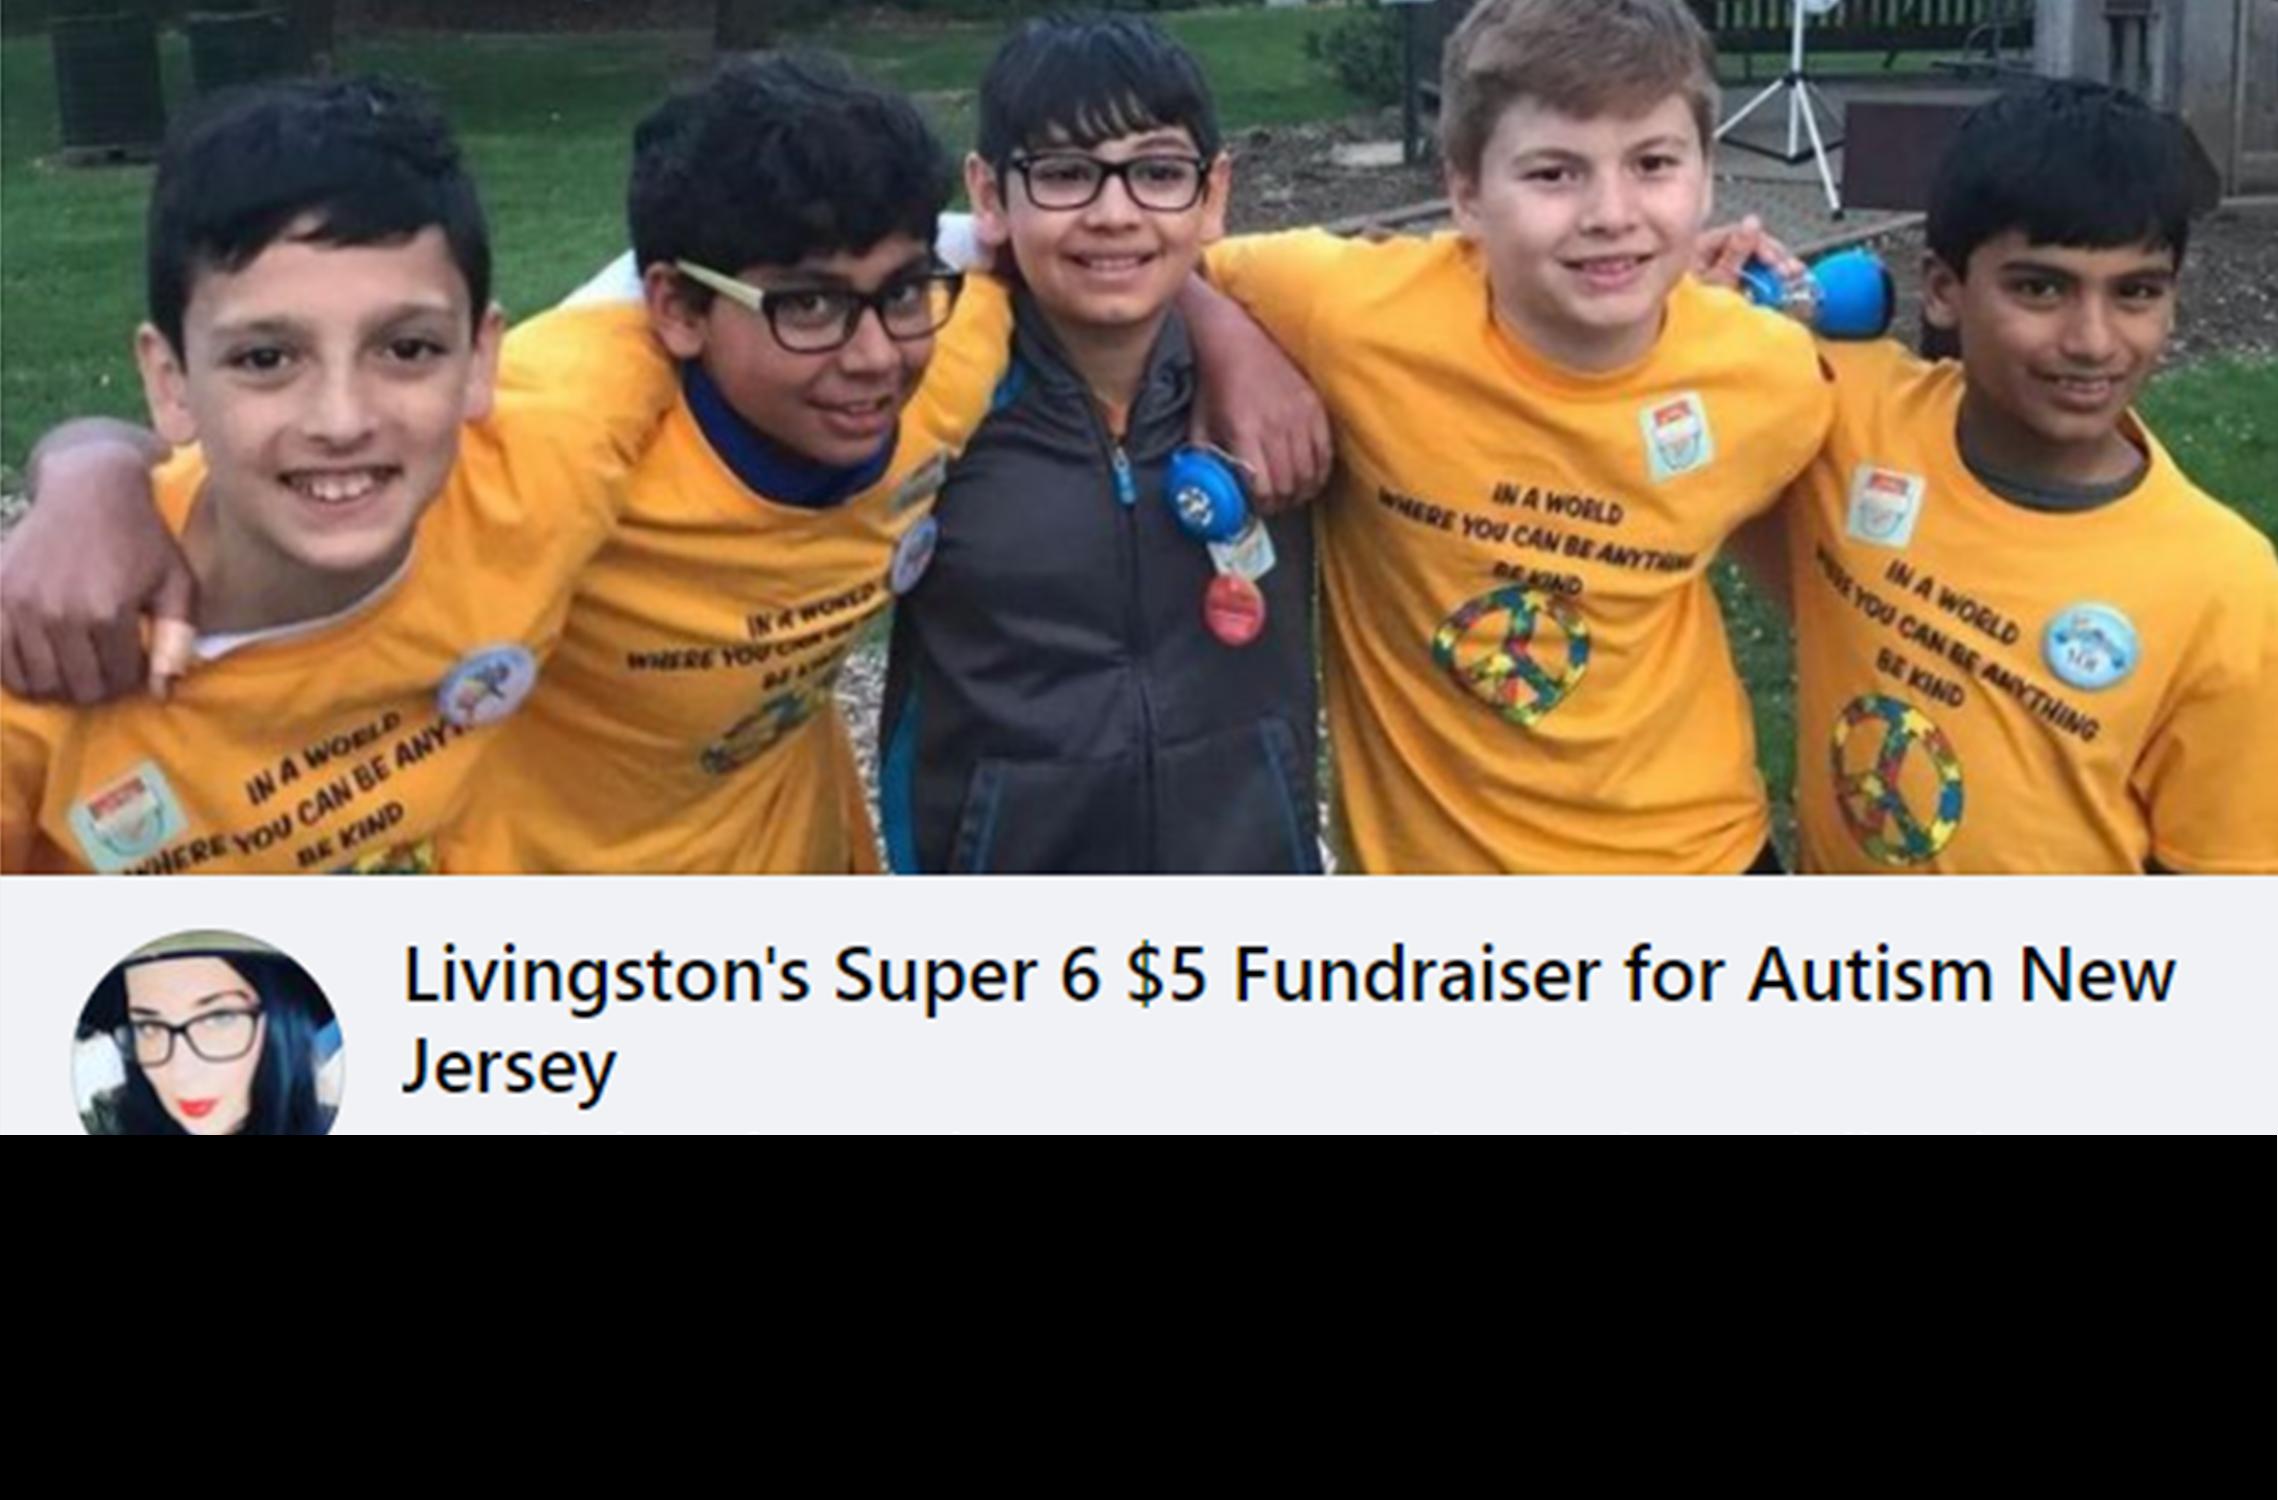 super 6 facebook fundraiser